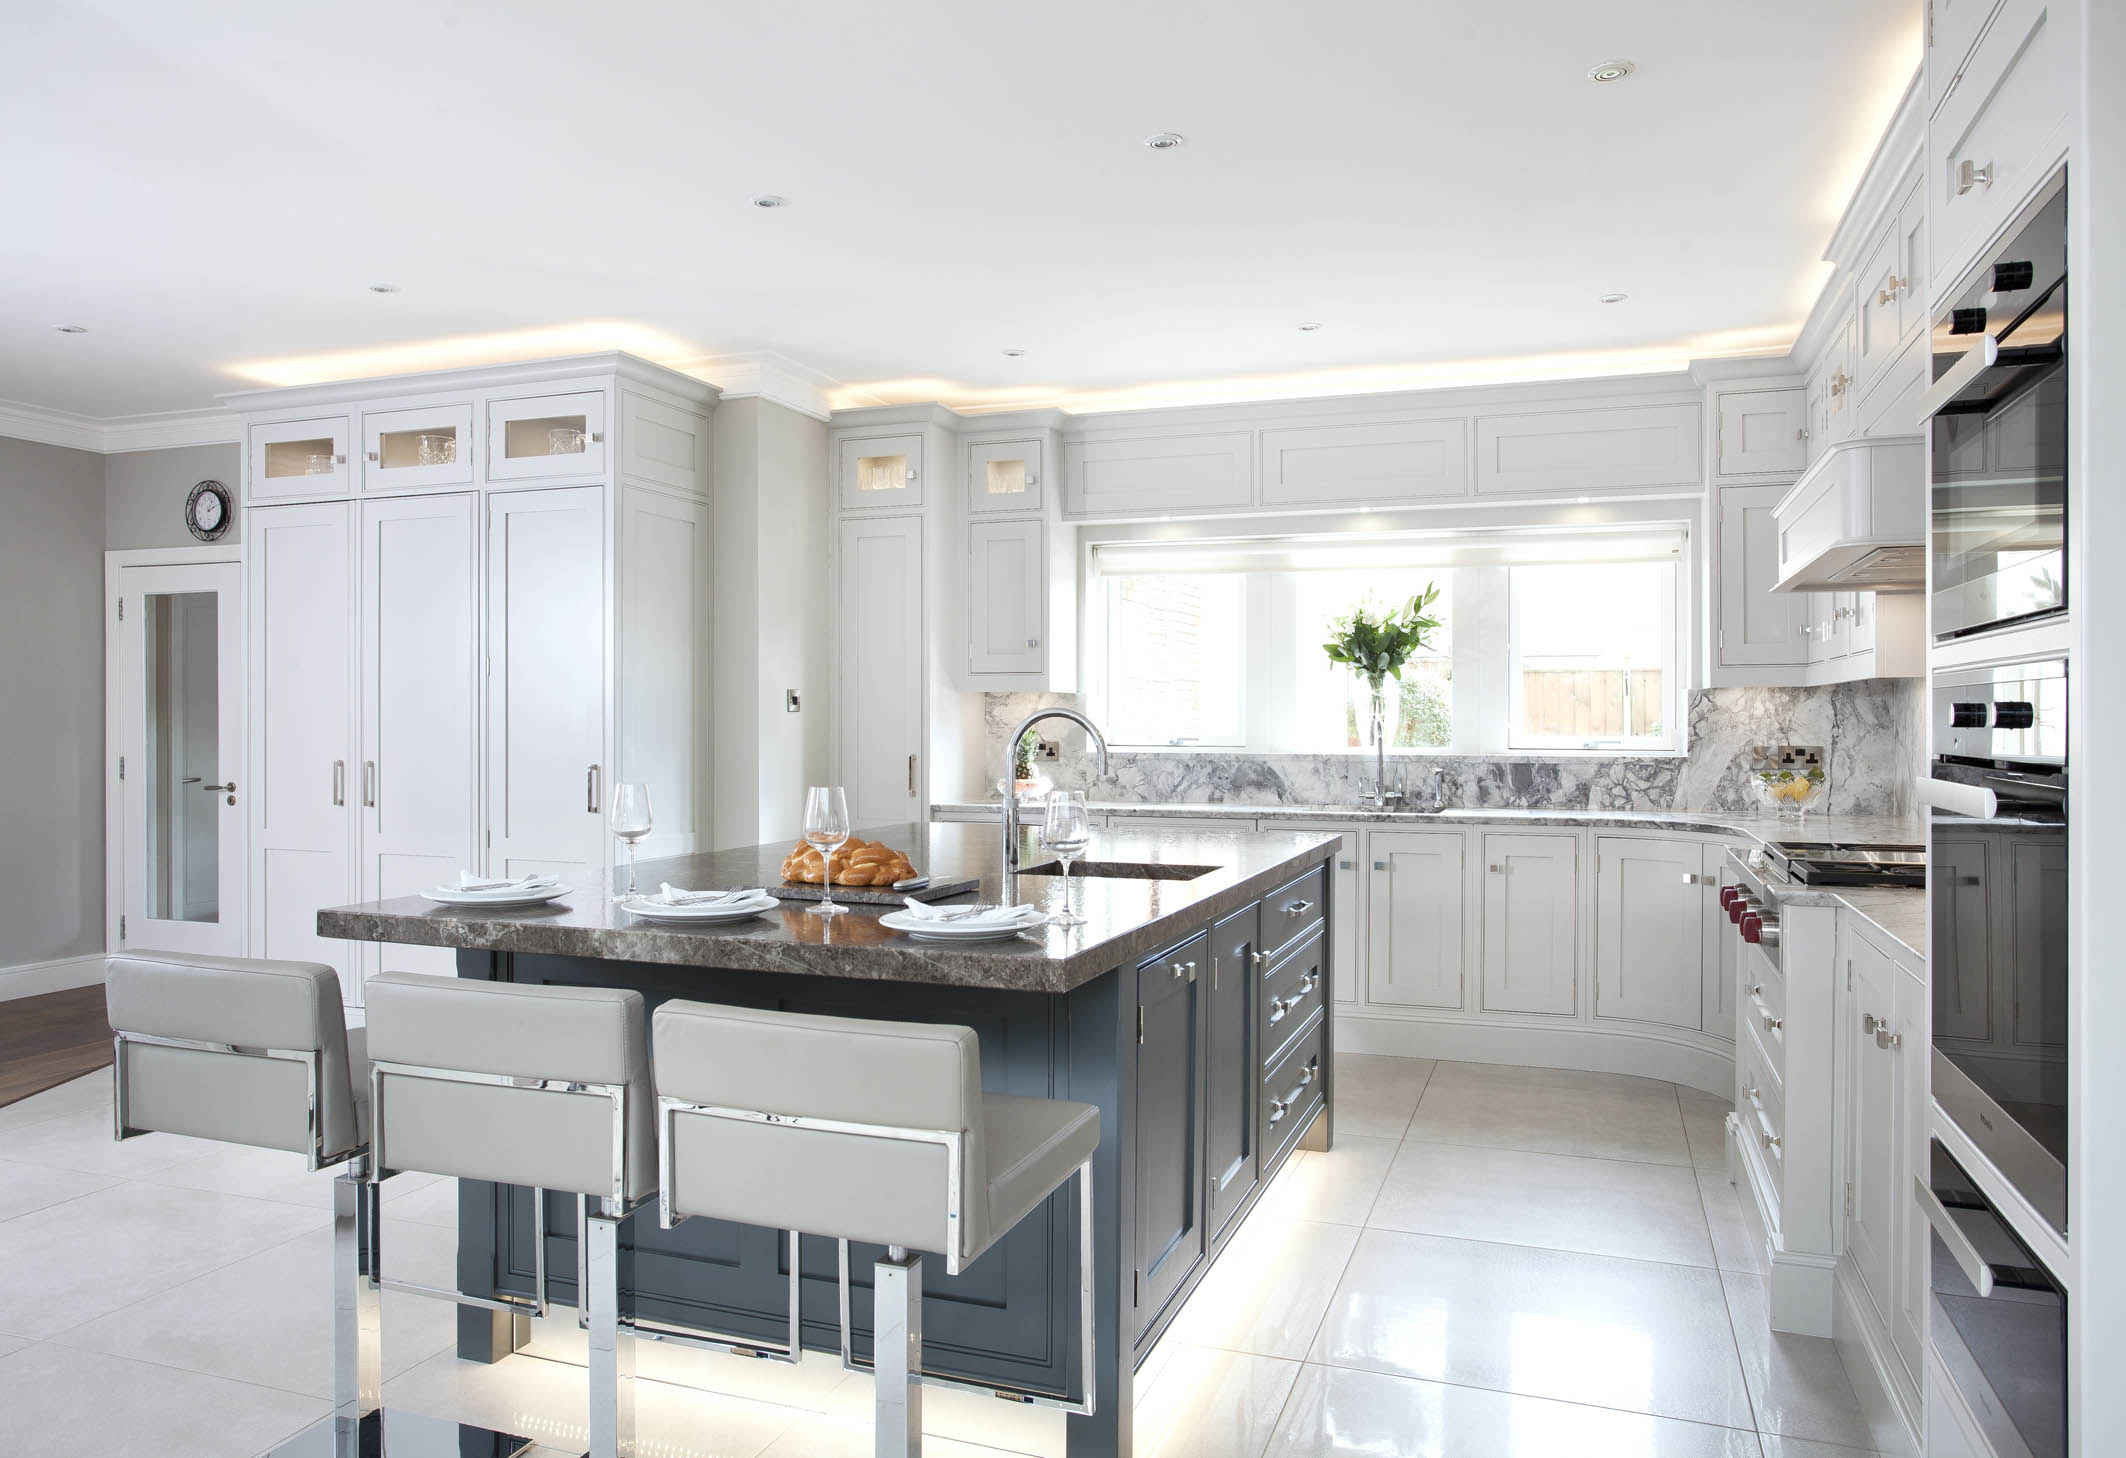 Carrickmines Detached Home Inframe Handpainted Kitchen